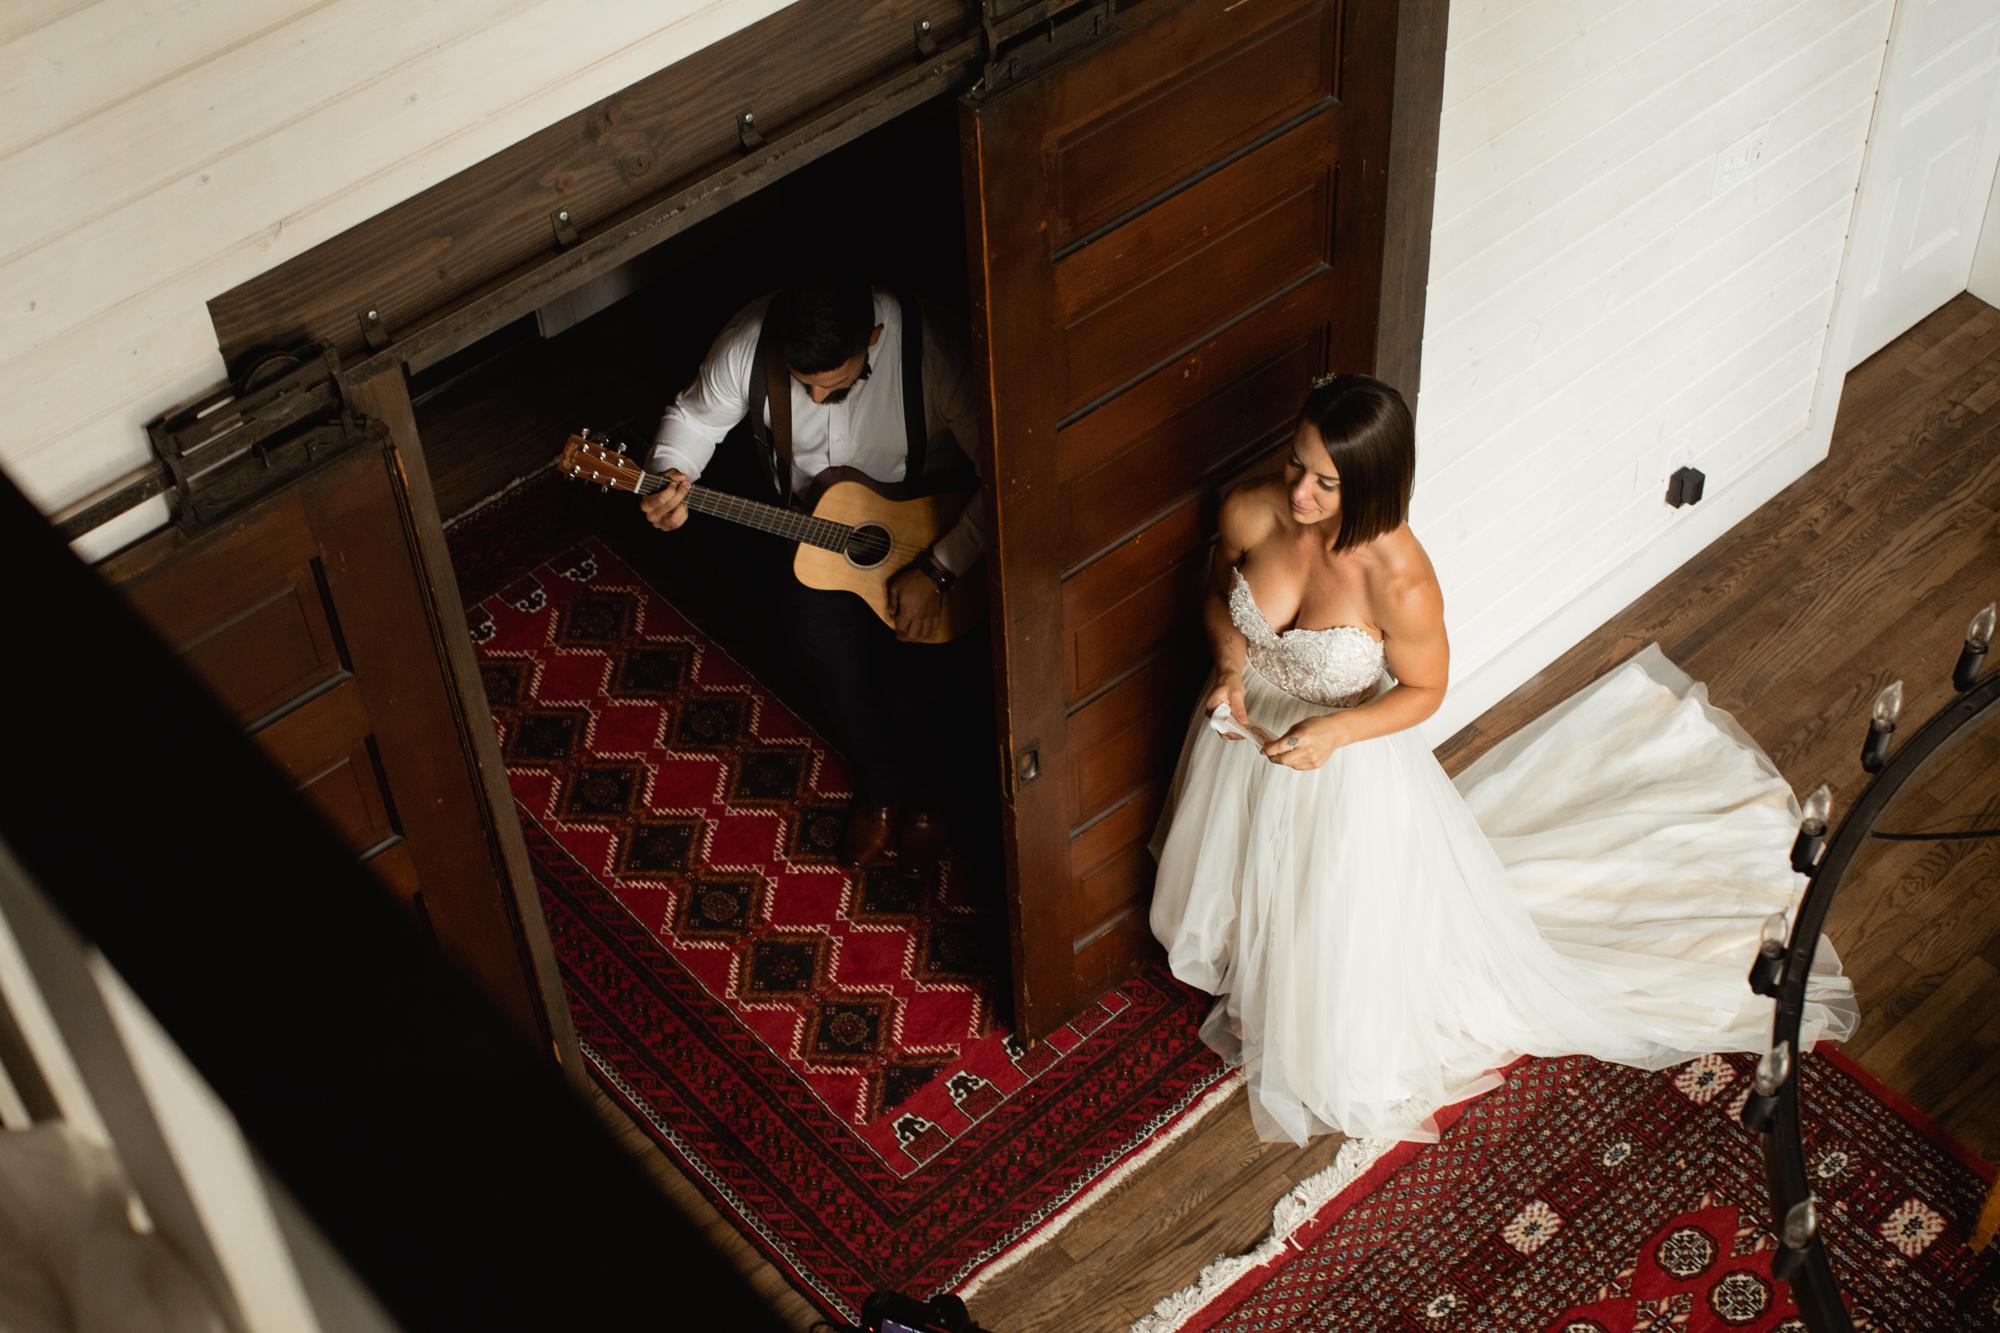 336-Willow_and_Wolf_Wedding_Photography_Charlene_and_Tyler_Revelstoke_WaterFall_Elopment_BegbieFalls_GettingReady_BEC_7366.jpg